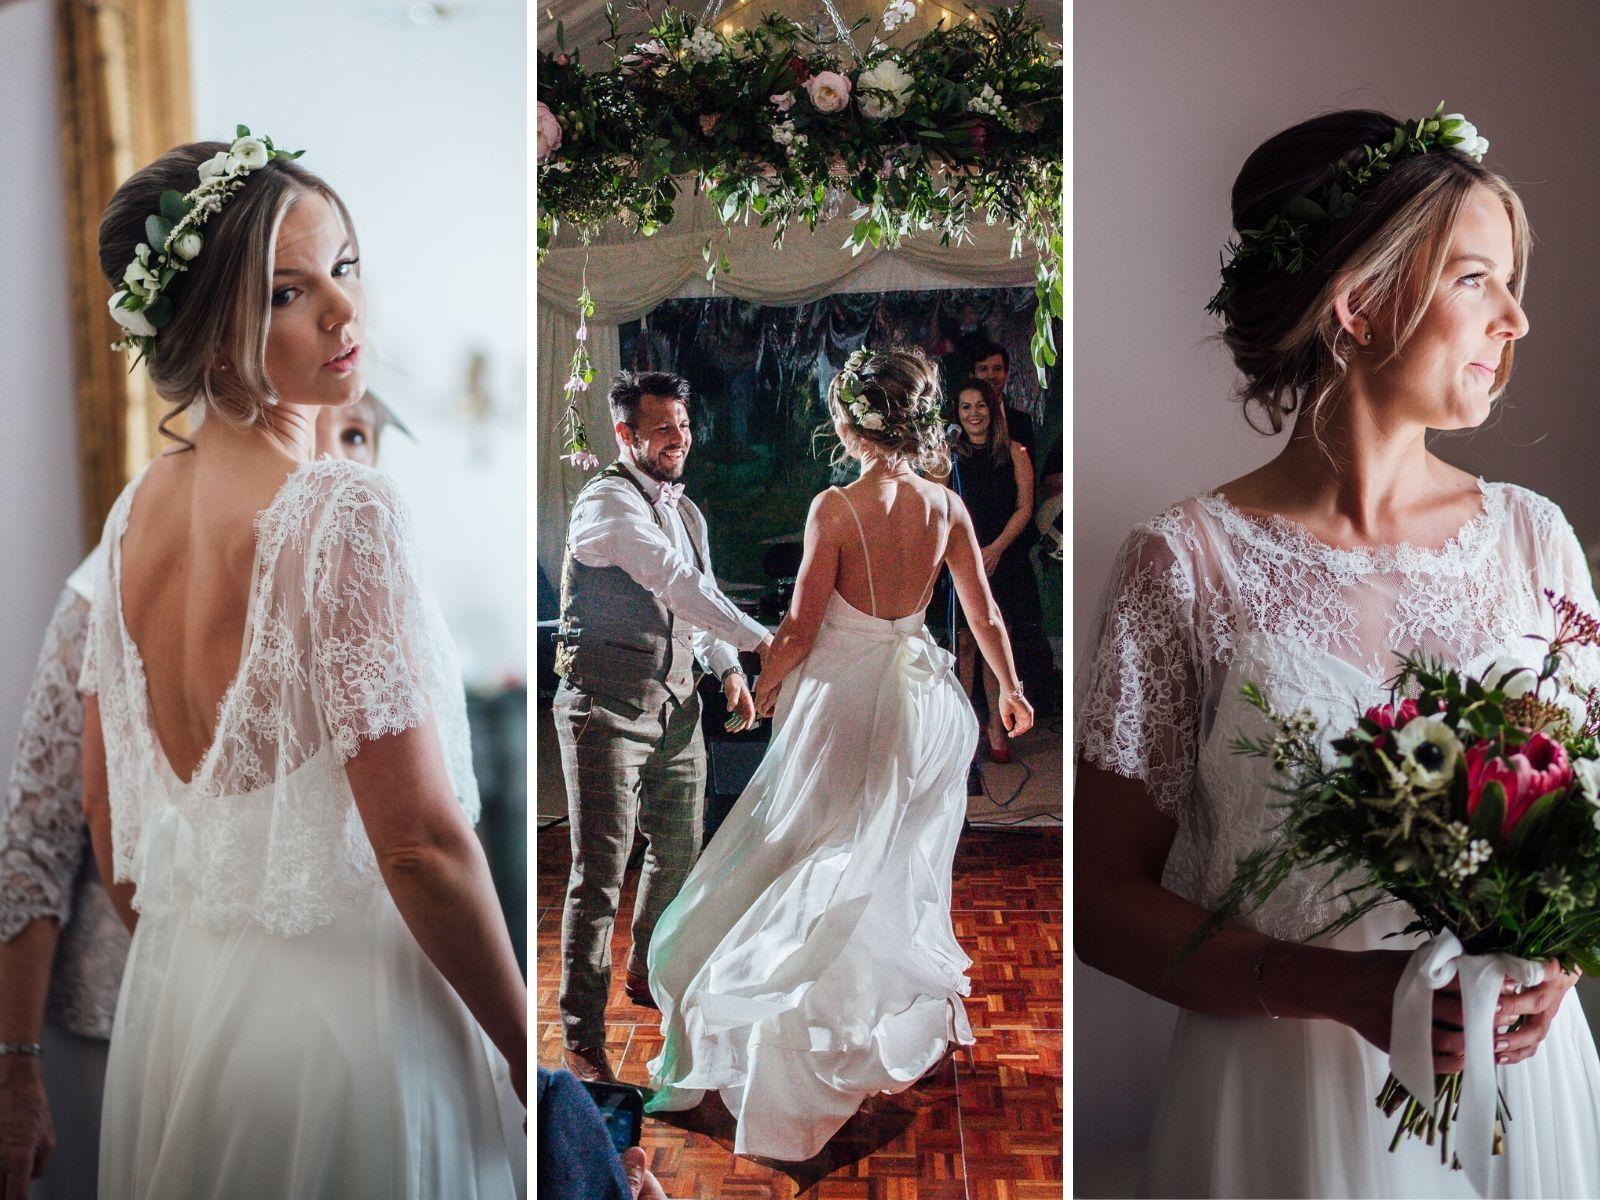 Bohemian wedding dresses at Boho Bride Boutique in Stratford Upon Avon